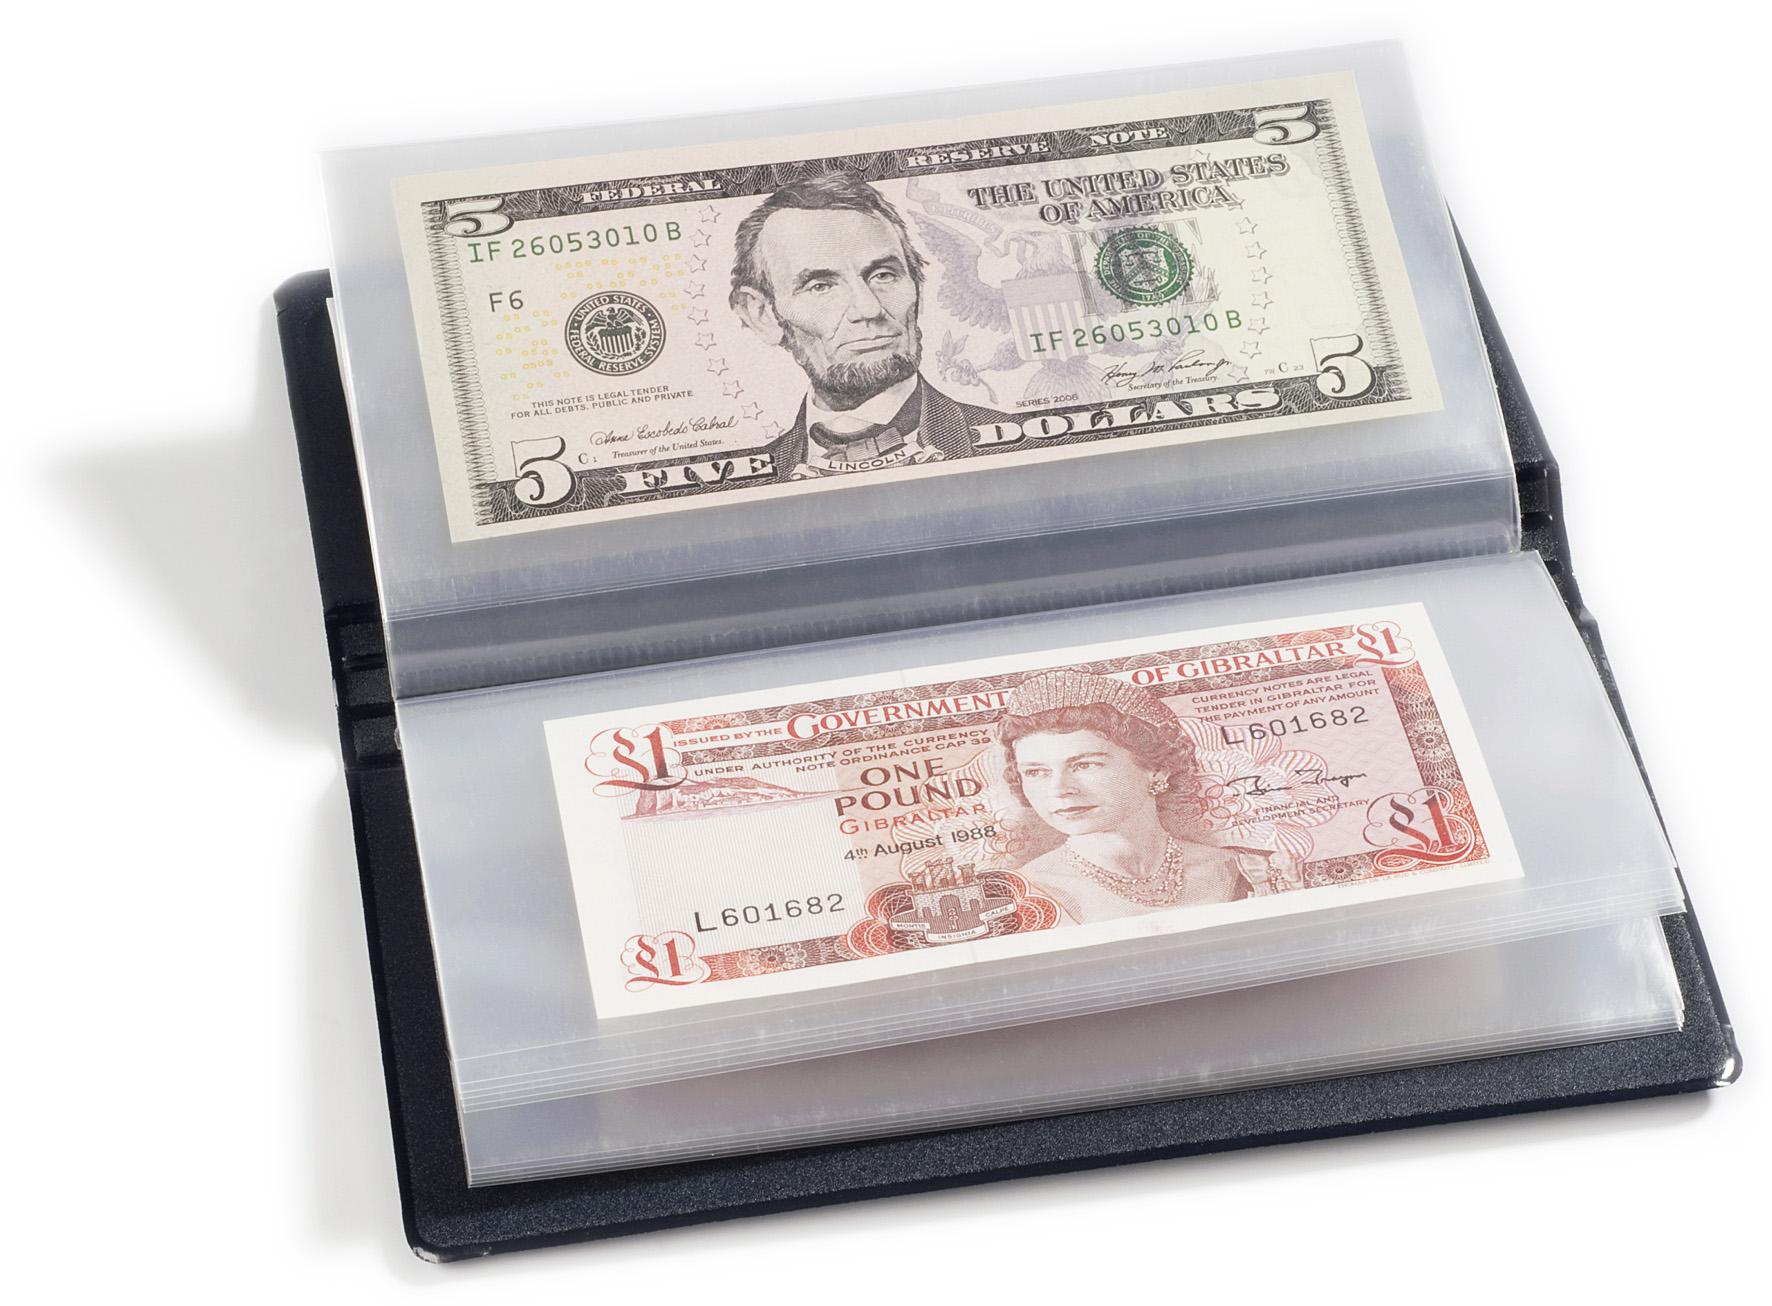 Multi-currency wallet press